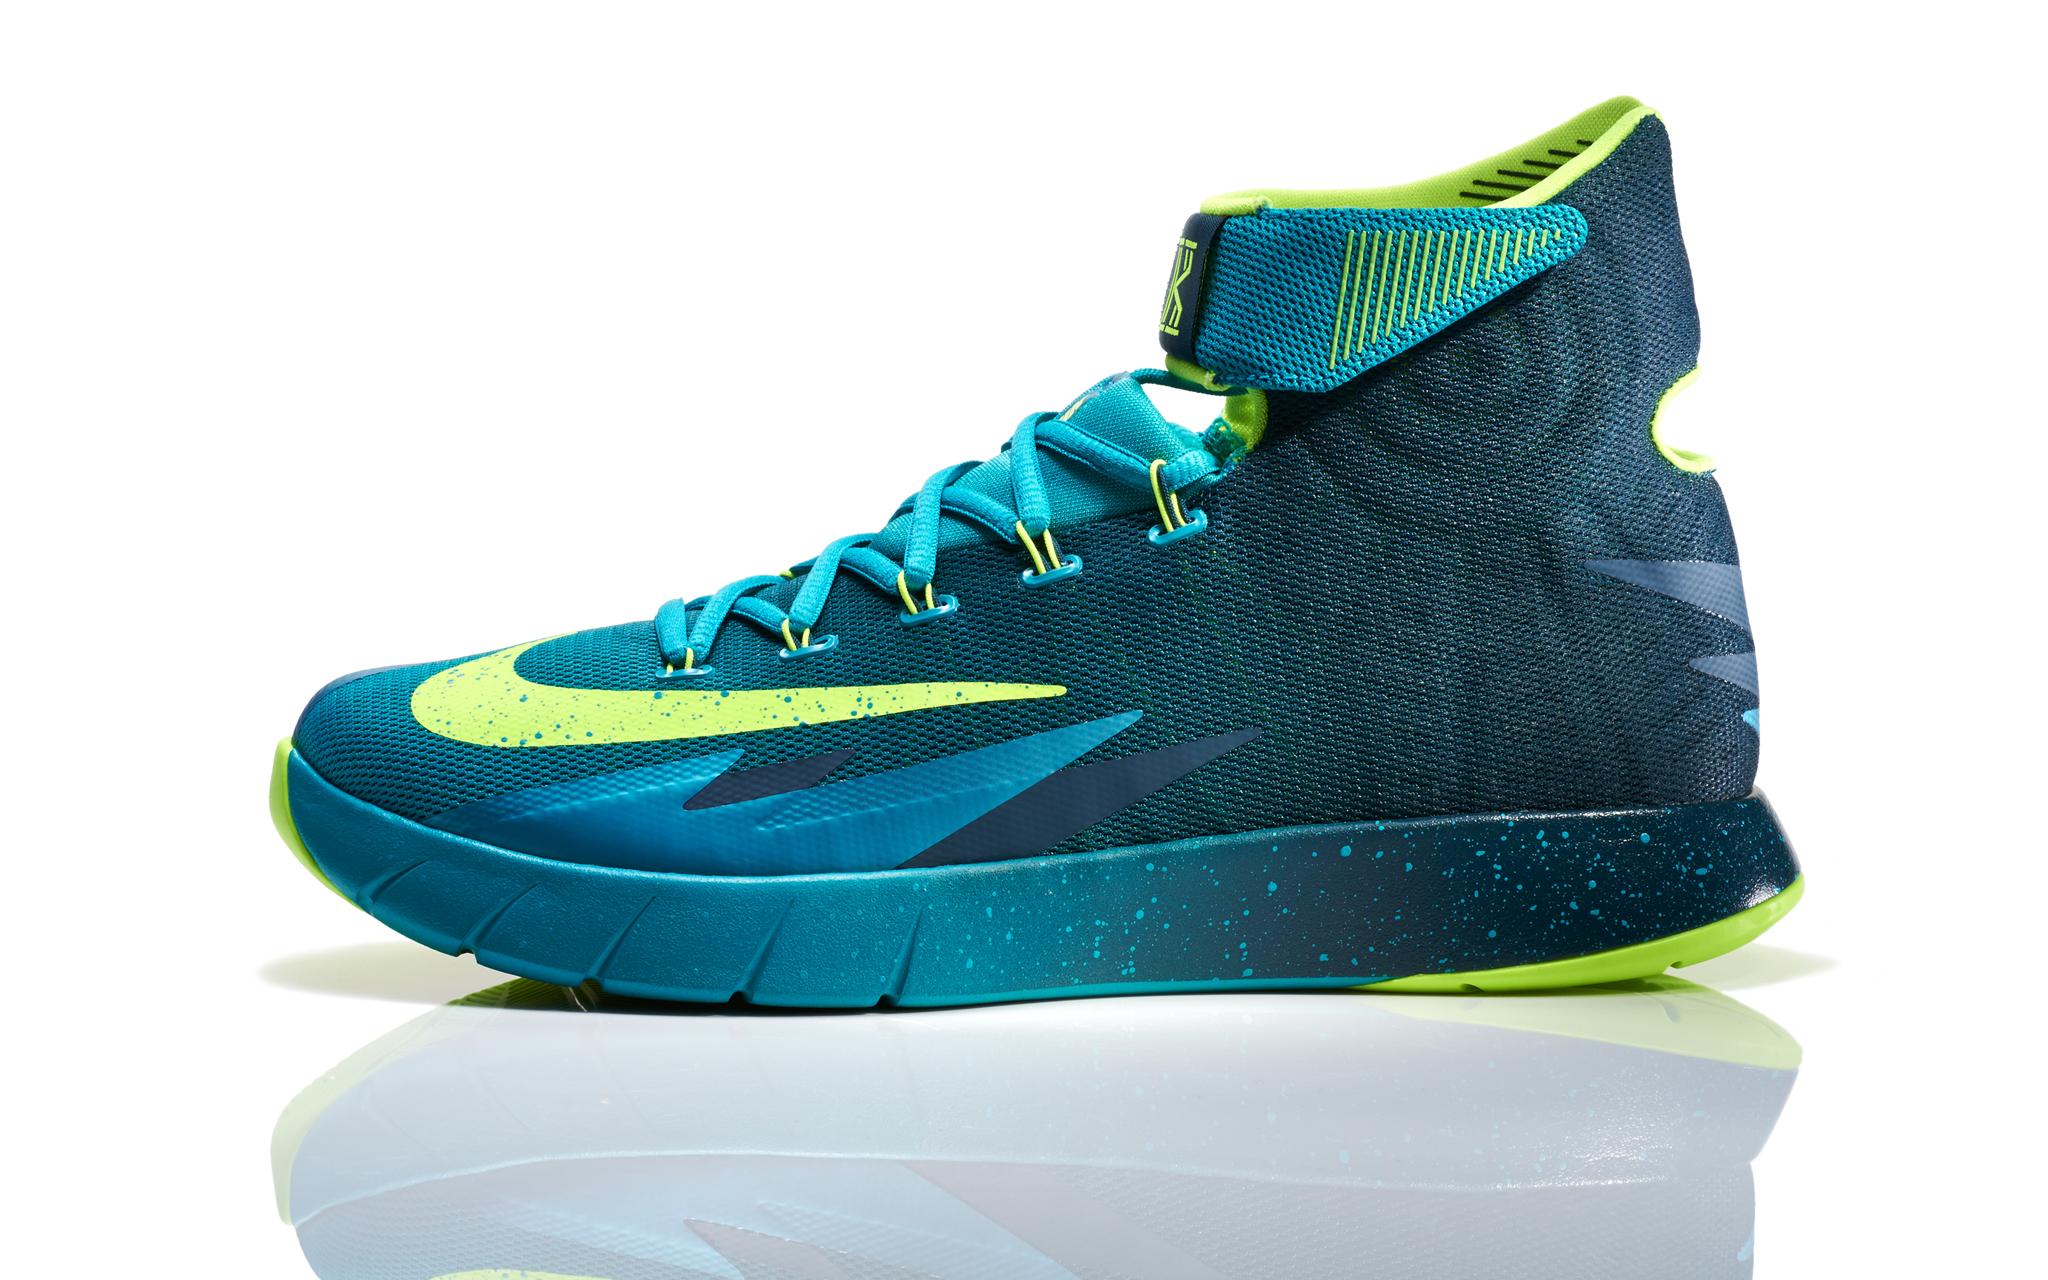 FL_Unlocked_Nike_Zoom_HyperRev_Kyrie_Irving_PE_6.jpg